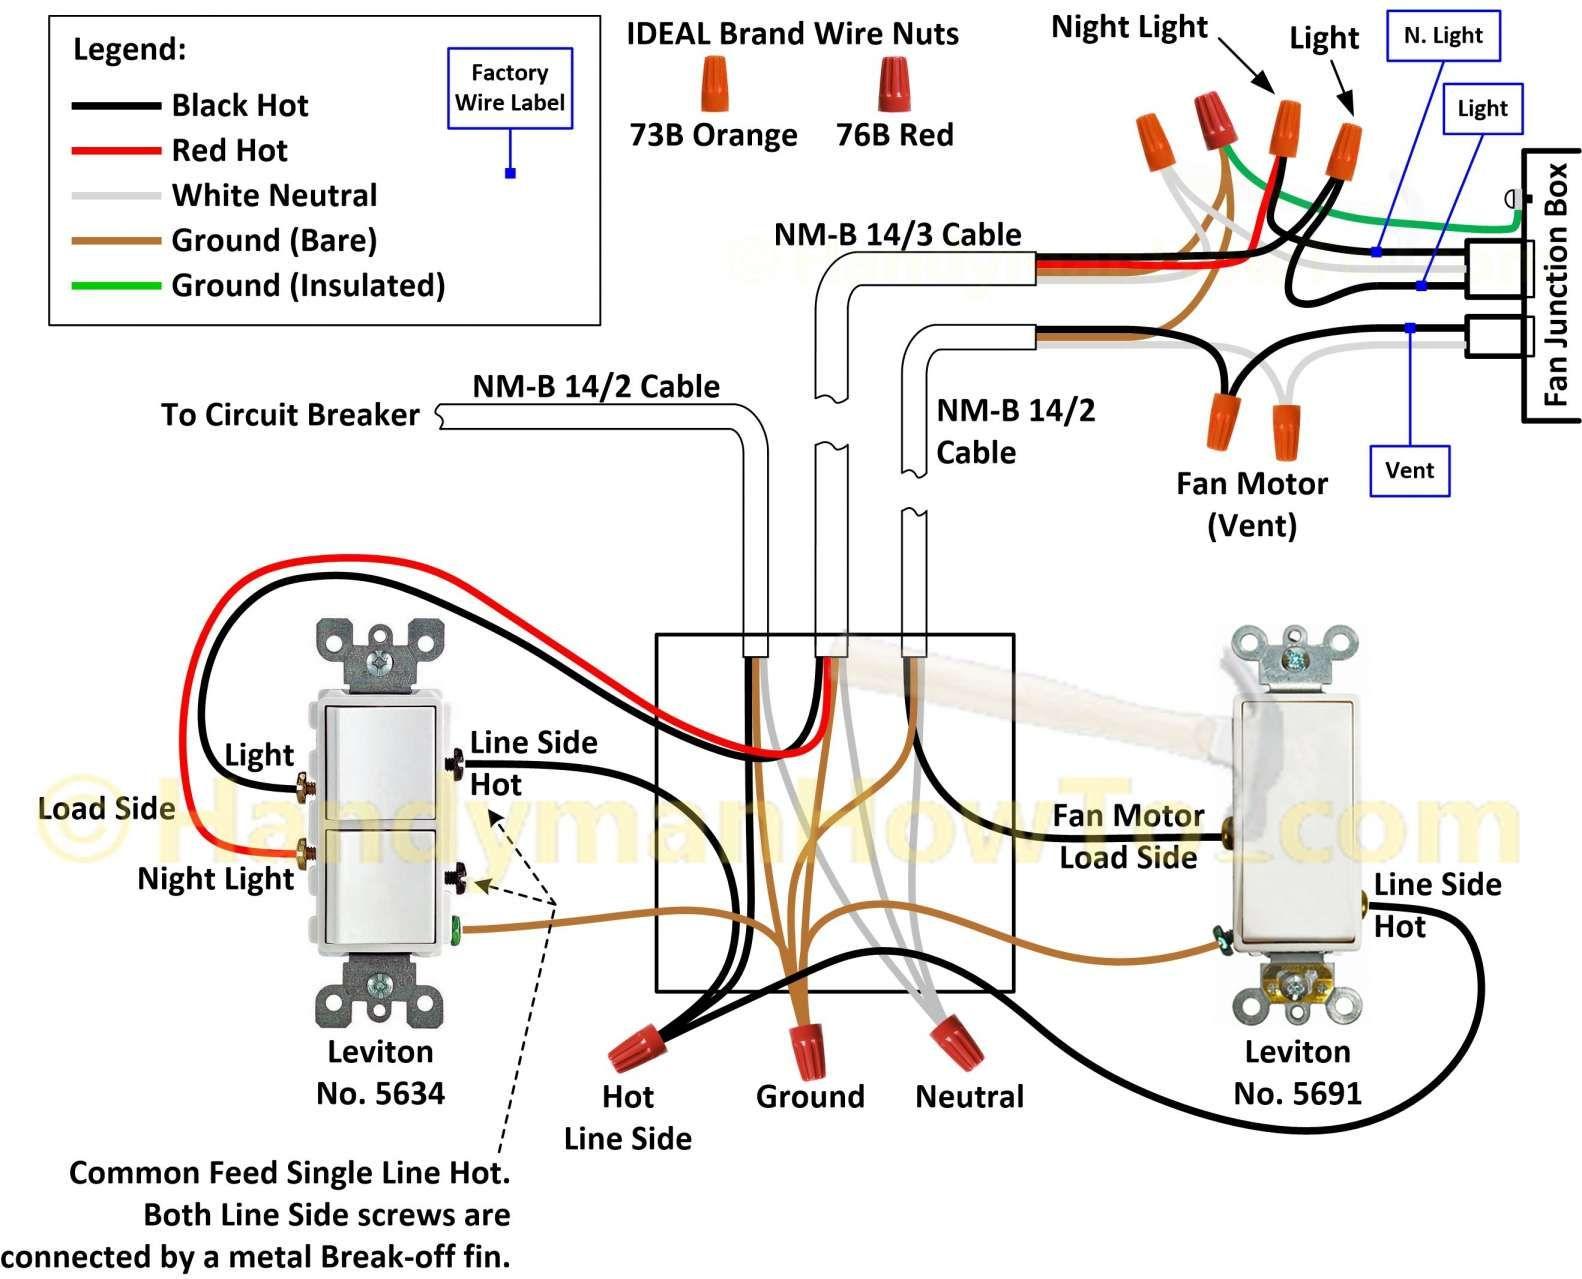 16 Asahi Electric Fan Wiring Diagram Wiring Diagram In 2020